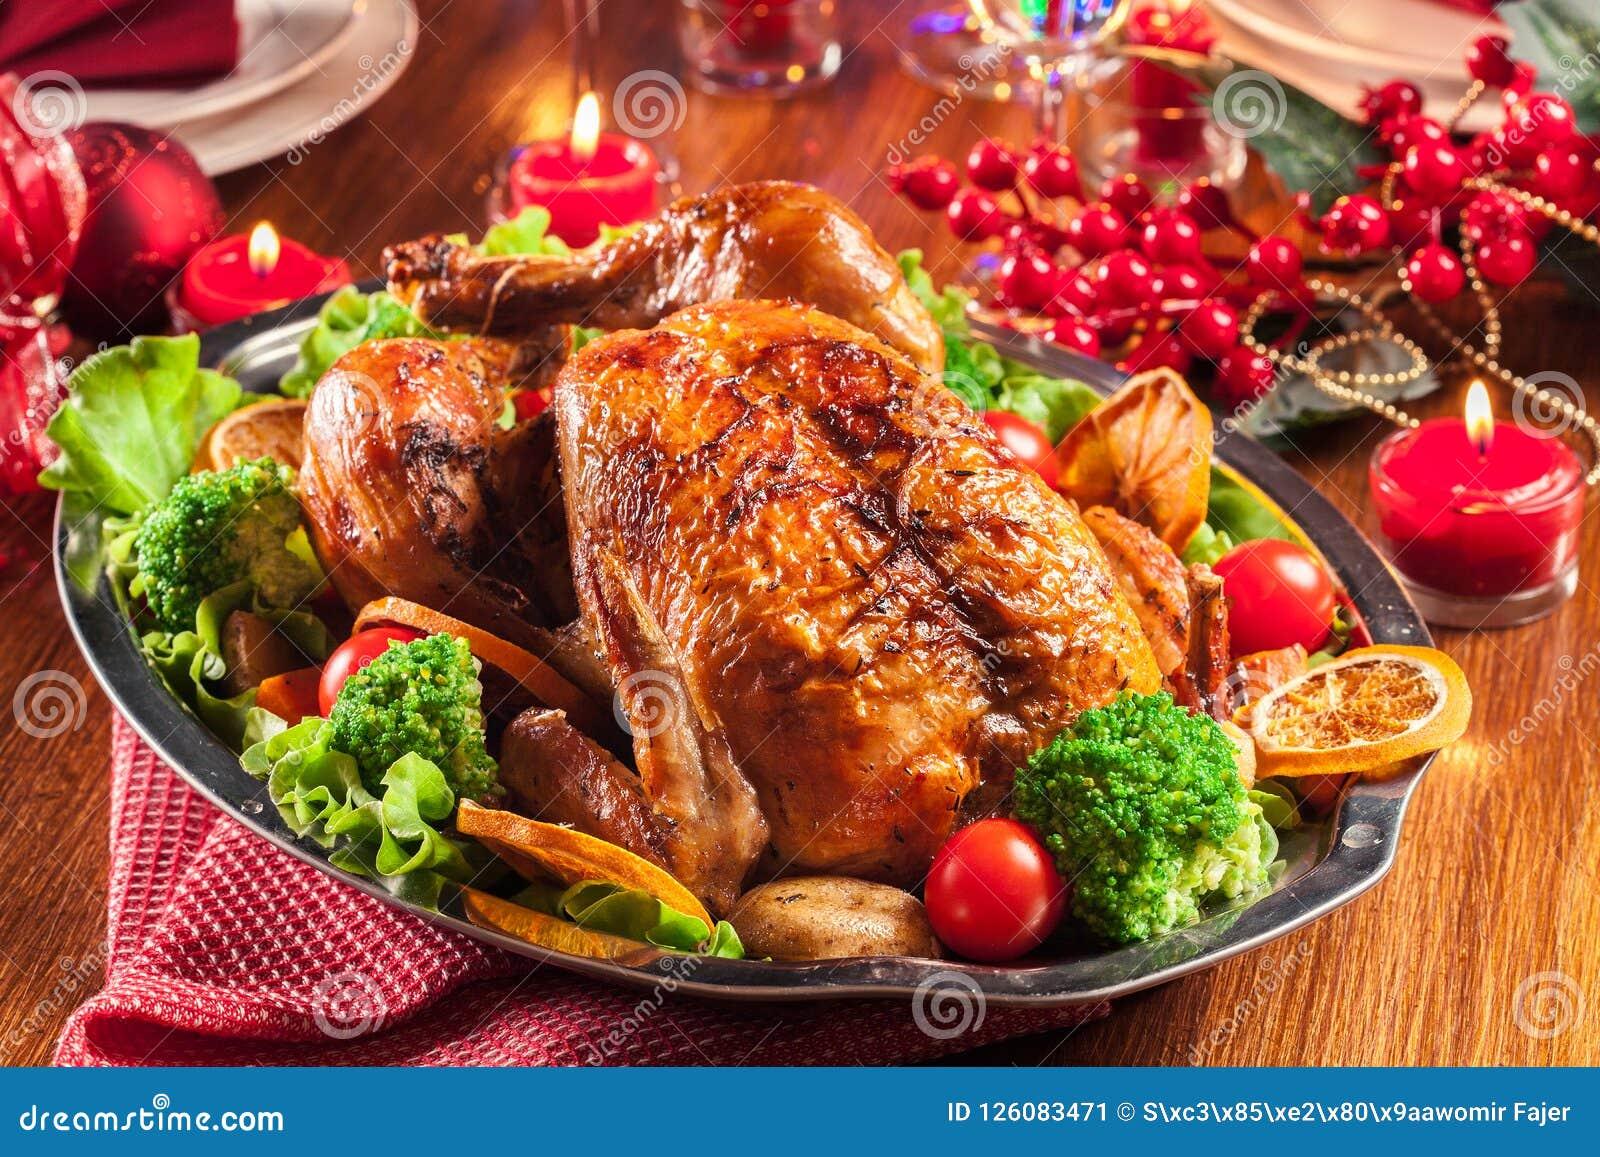 Galinha inteira cozida ou roasted na tabela do Natal